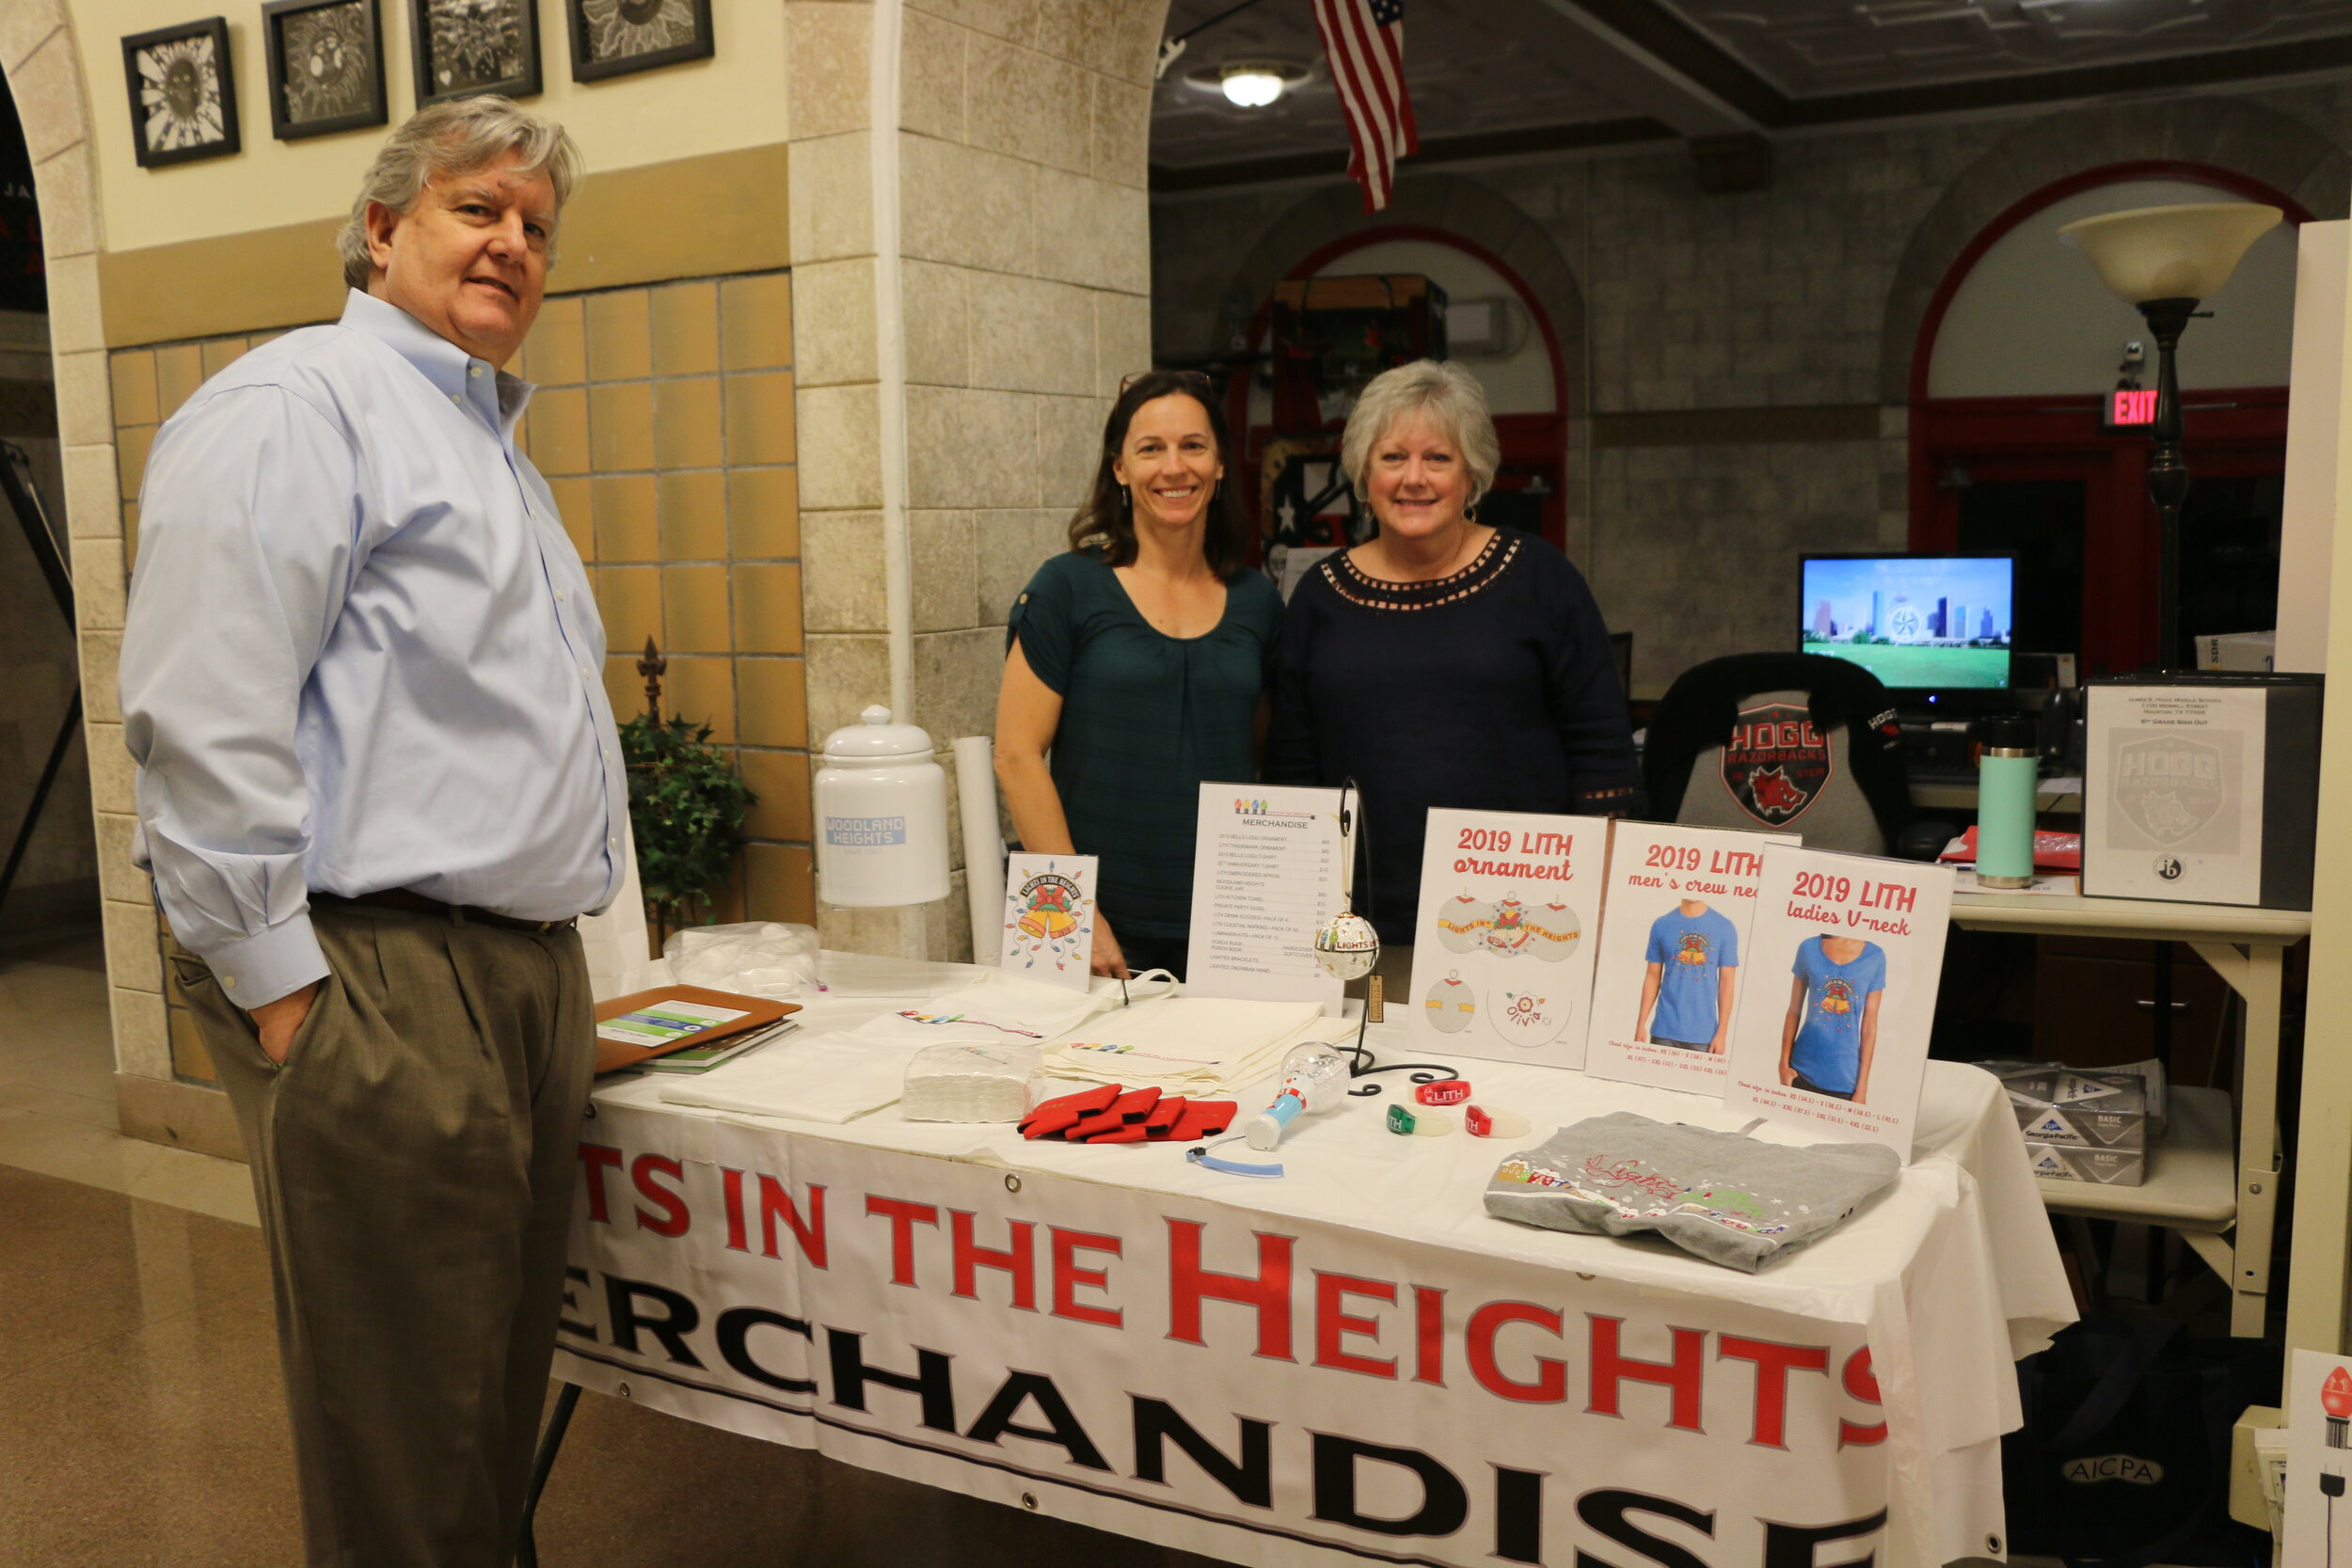 (L-to-R) WHCA President, Harry McMahon, former Treasurer Melissa McKee and former Secretary Beth Allen-Brock.